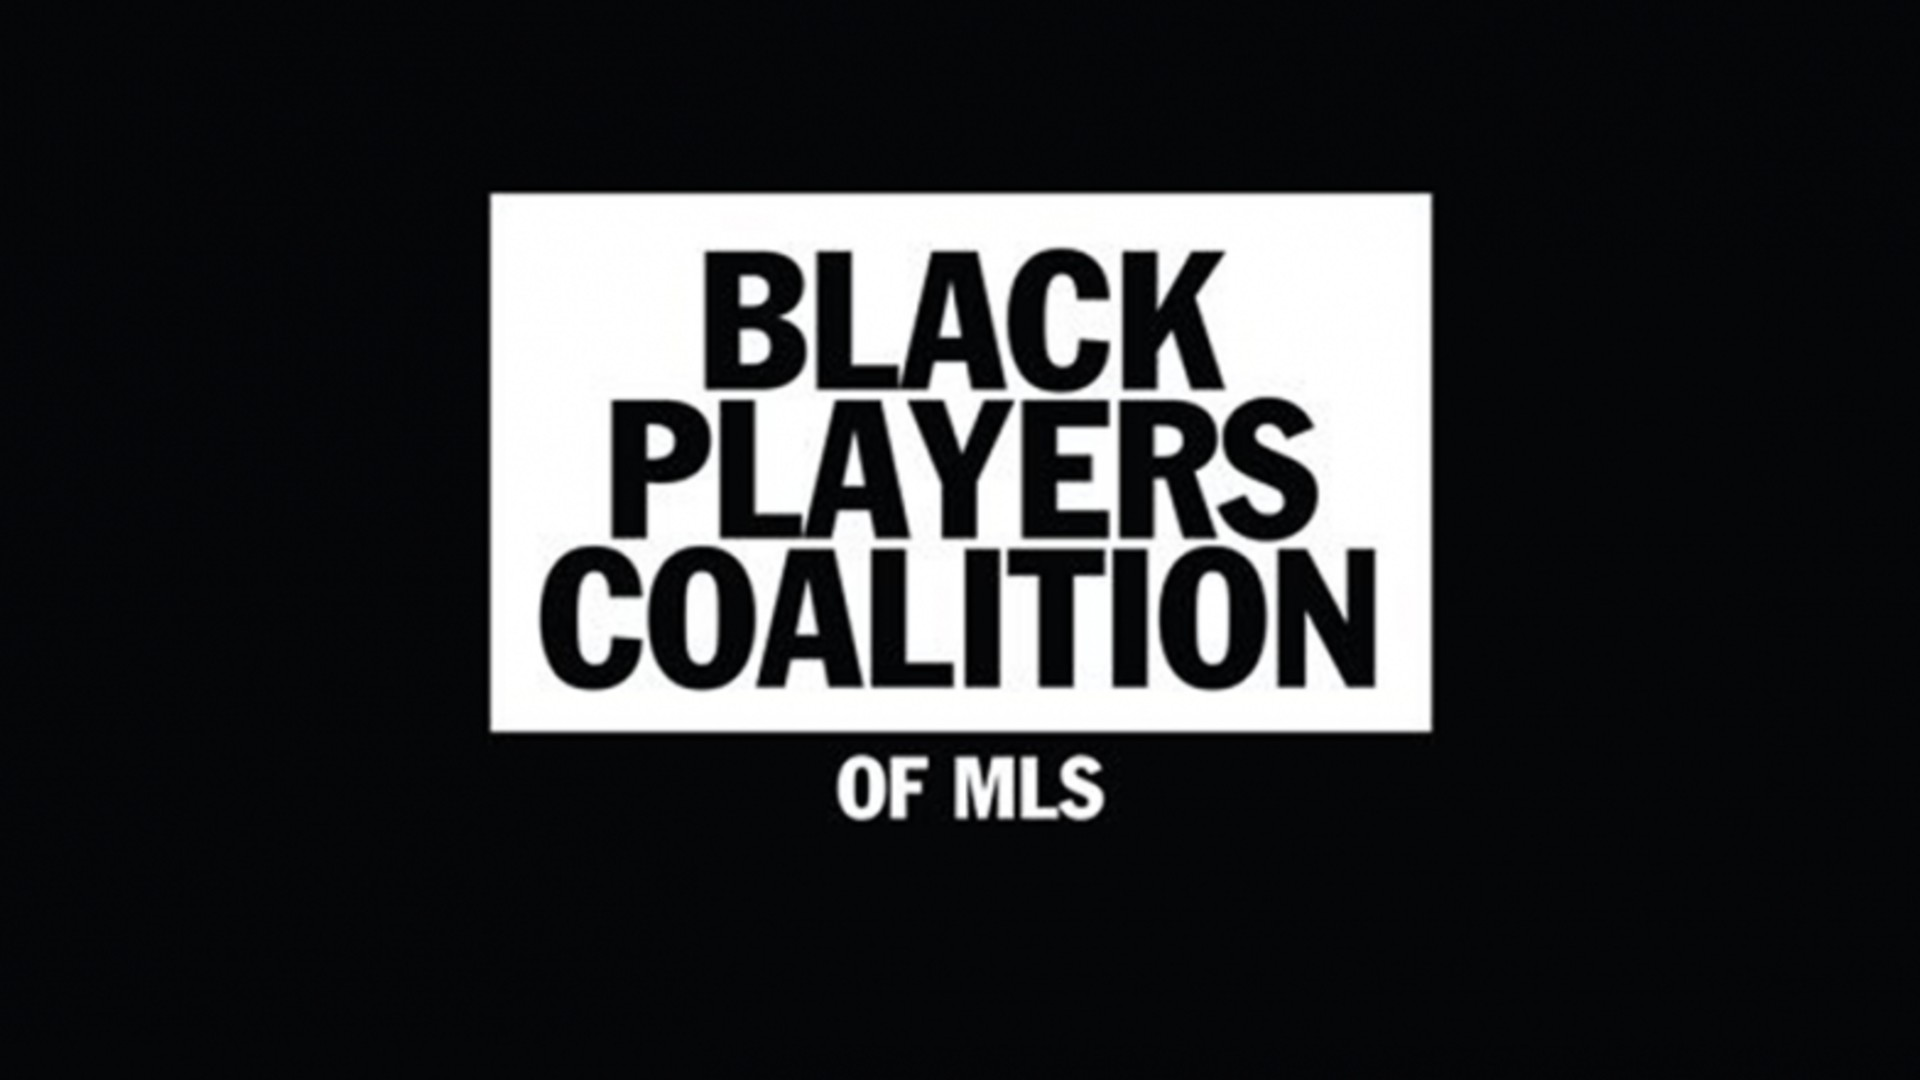 Black-players-coalition-logo_kbselanpl0ra1xls6ej3ltj9r